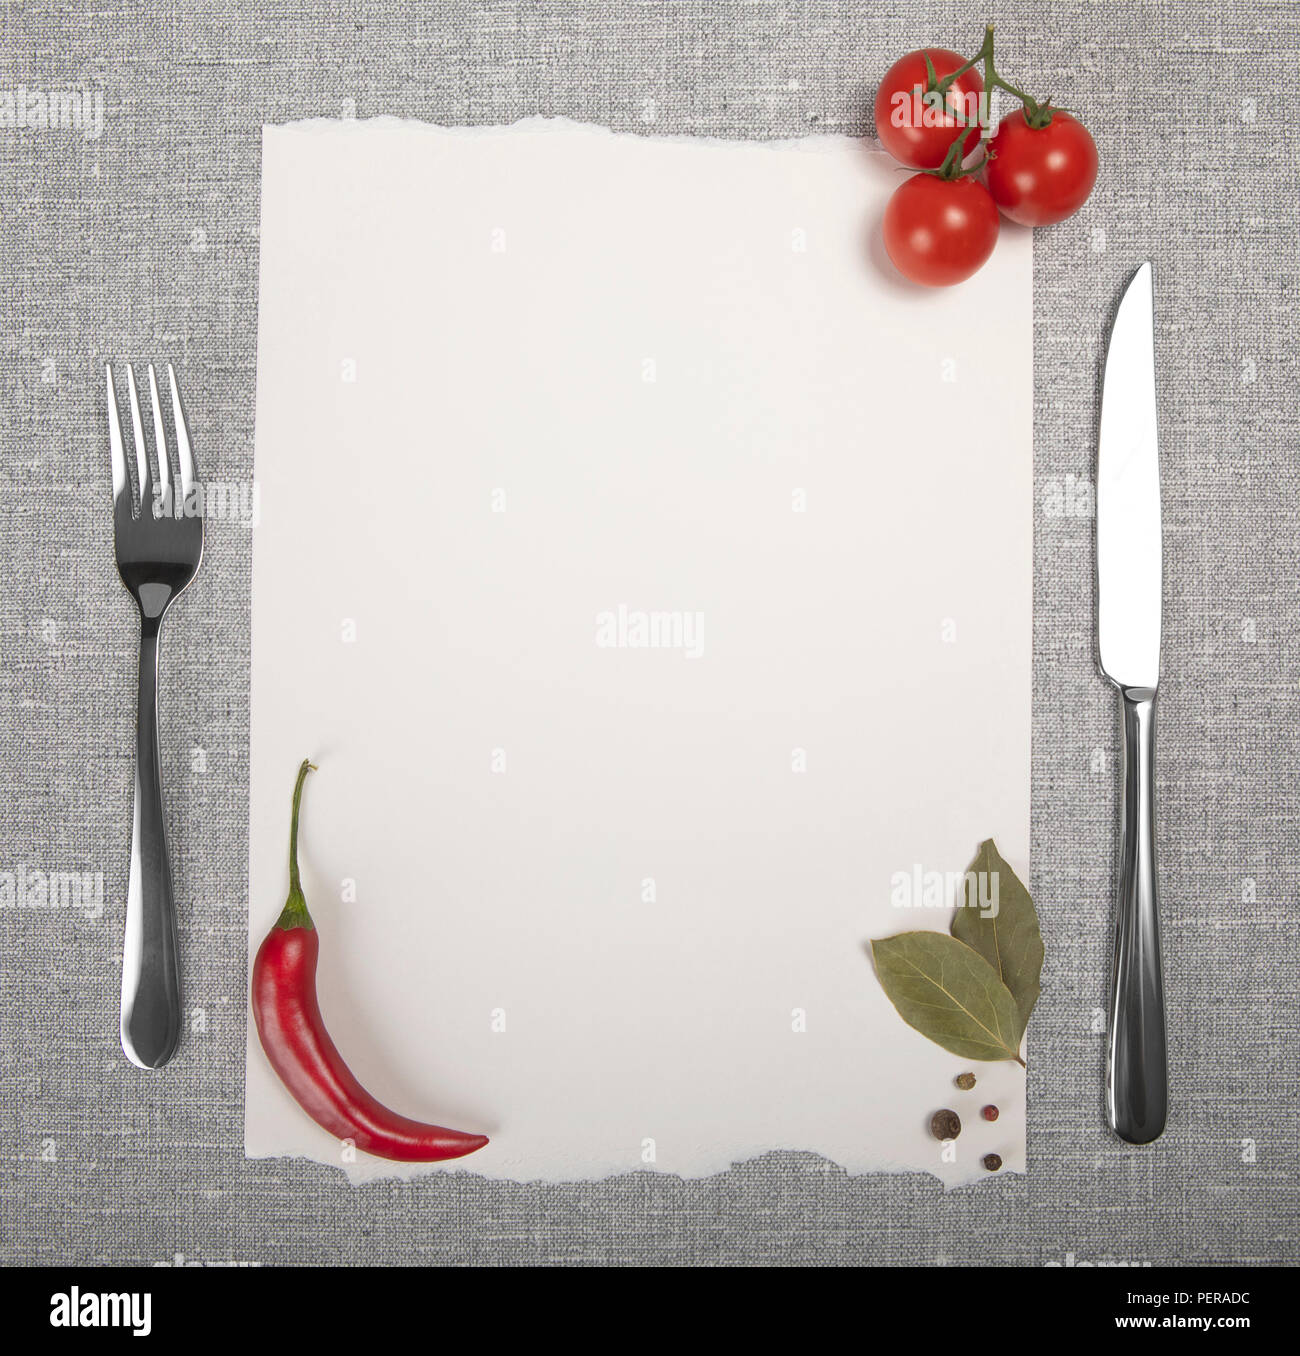 Wedding Food Menu Samples: Restaurant Cafe Menu, Template Design. Food Flyer Stock